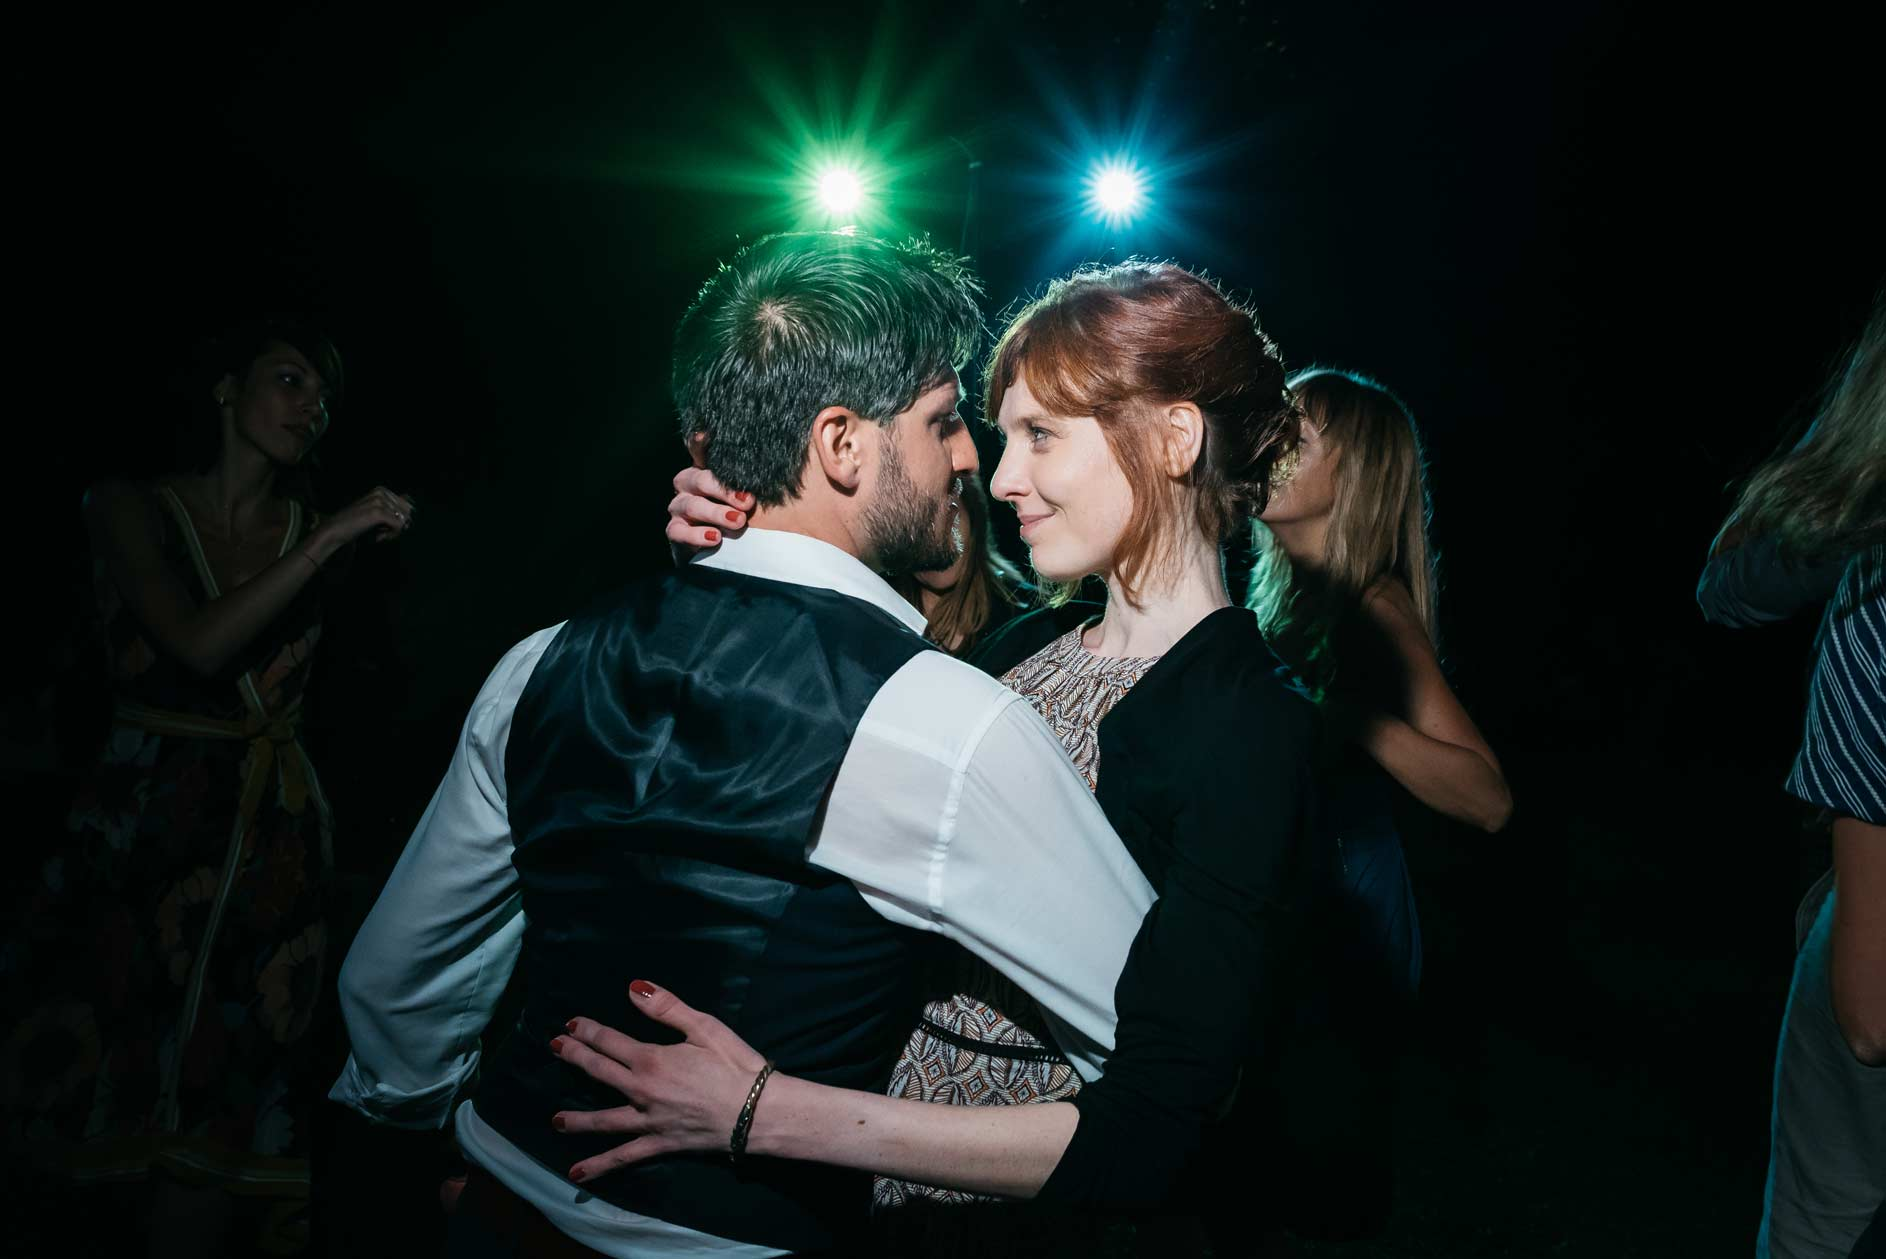 Fotografo-Matrimonio-Reportage-Festa